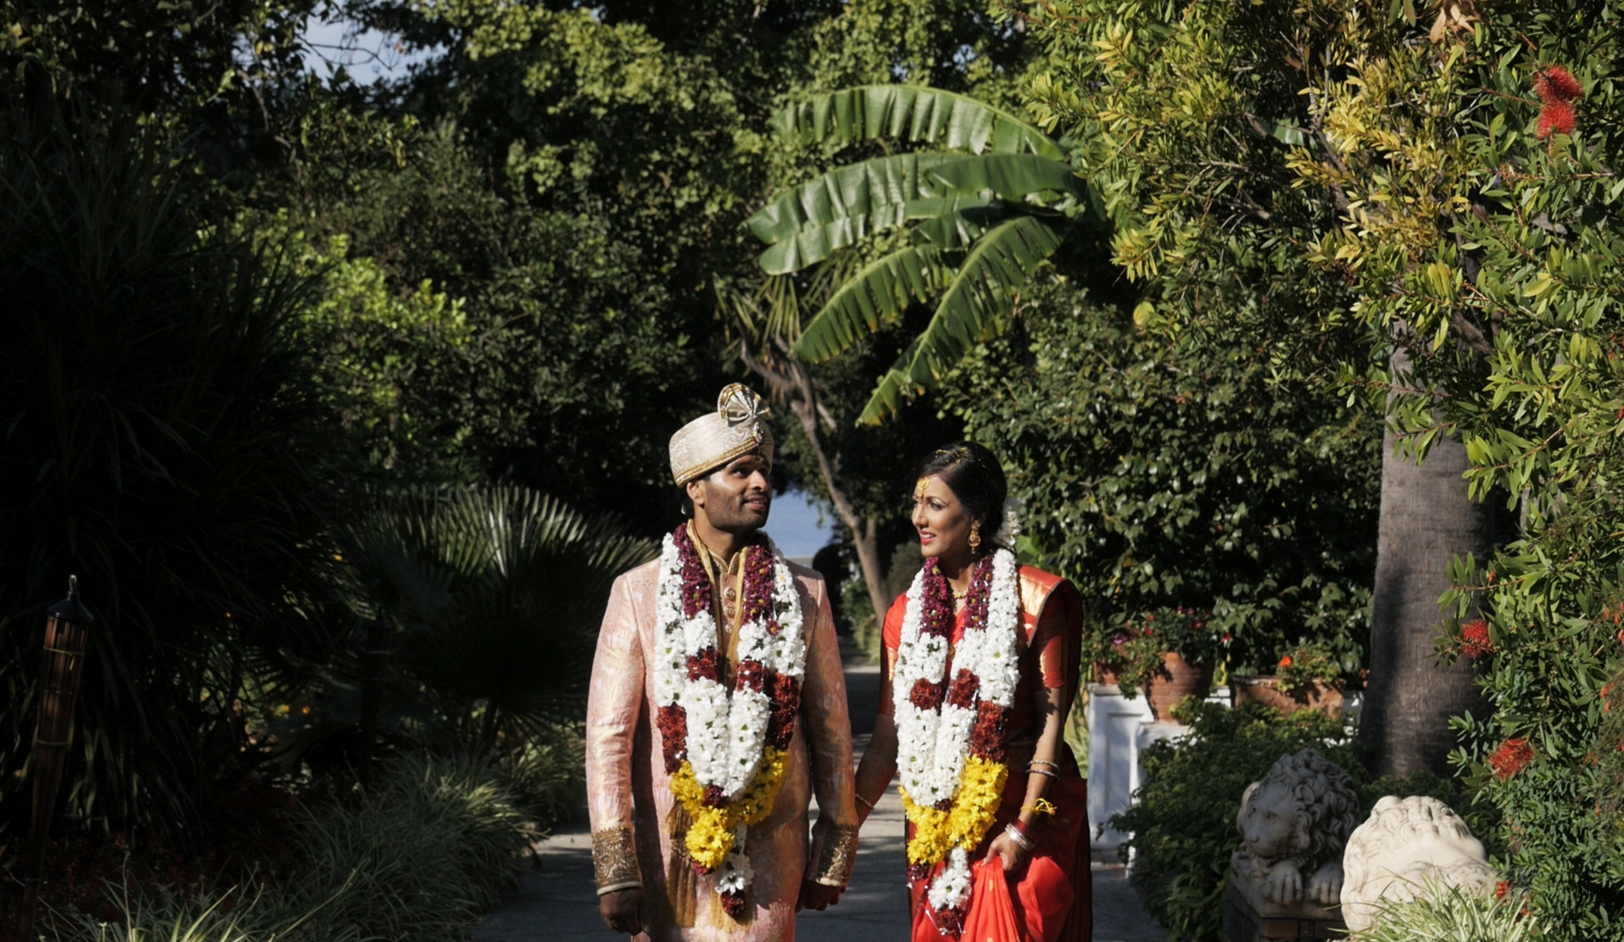 matrimonio-indiano-sposo-sposa-hotel-cocumella-sorrento-costiera-amalfitana.jpg